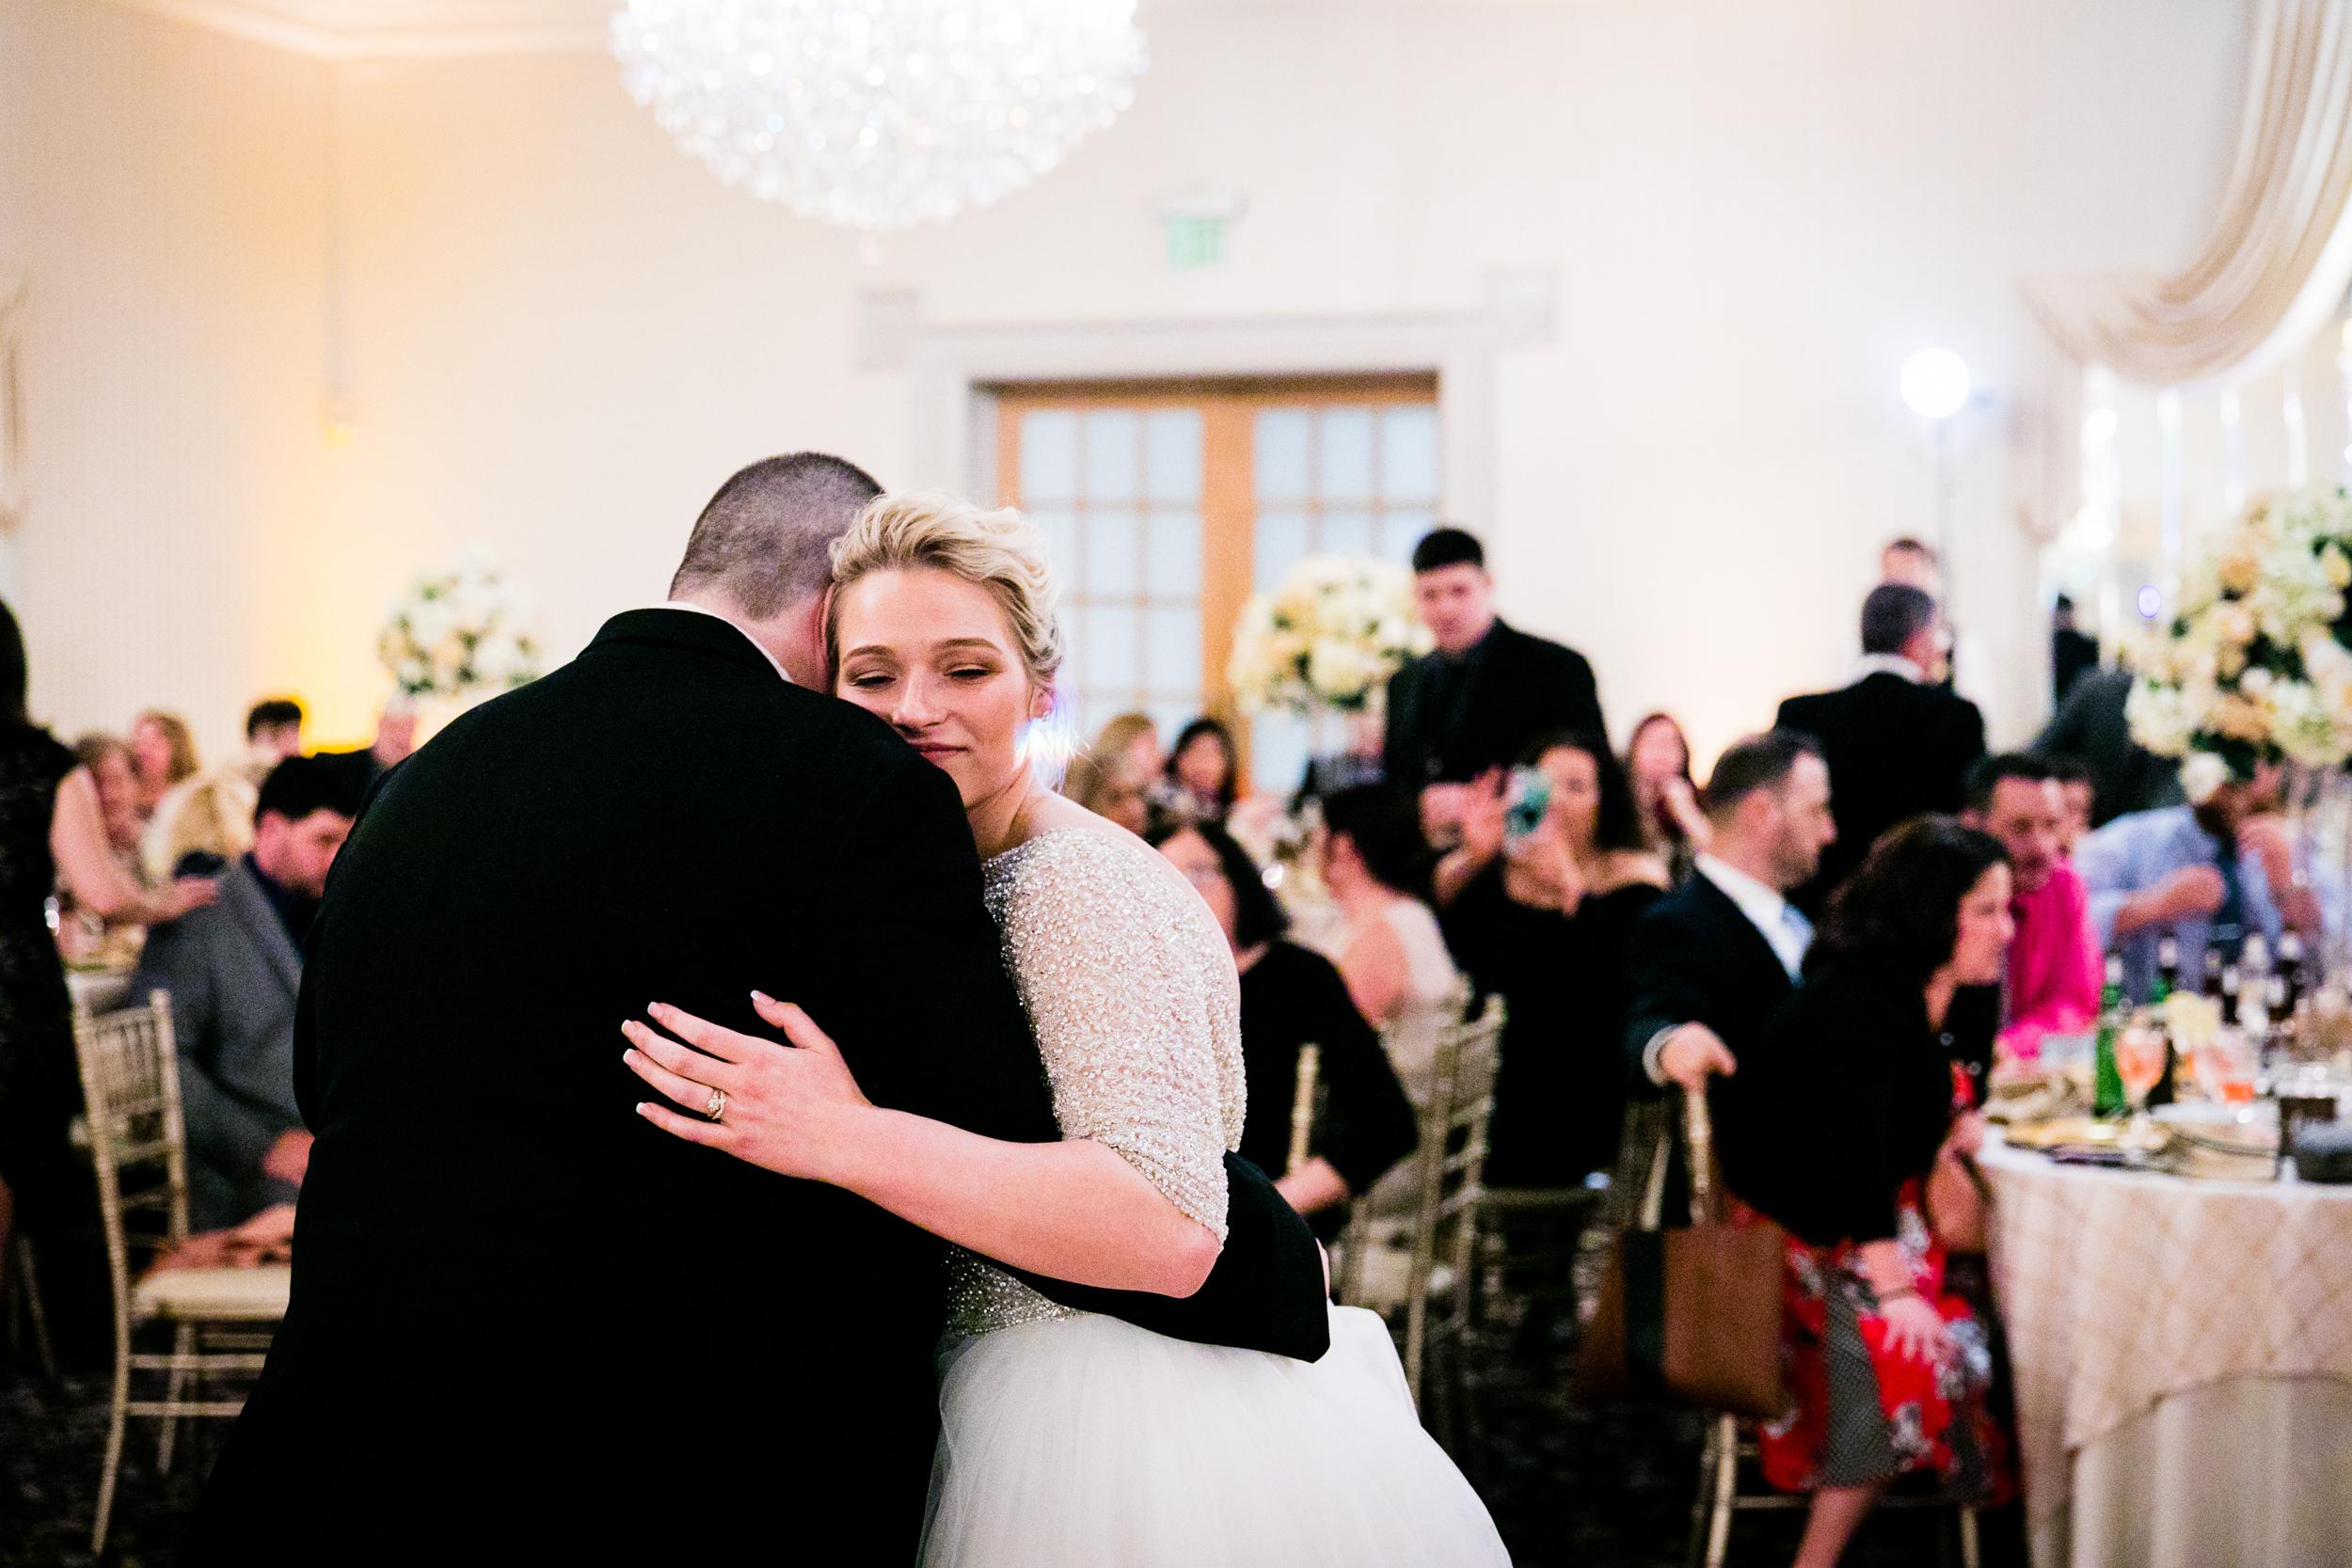 CELEBRATIONS BENSALEM WEDDING PHOTOGRAPHY-90.jpg